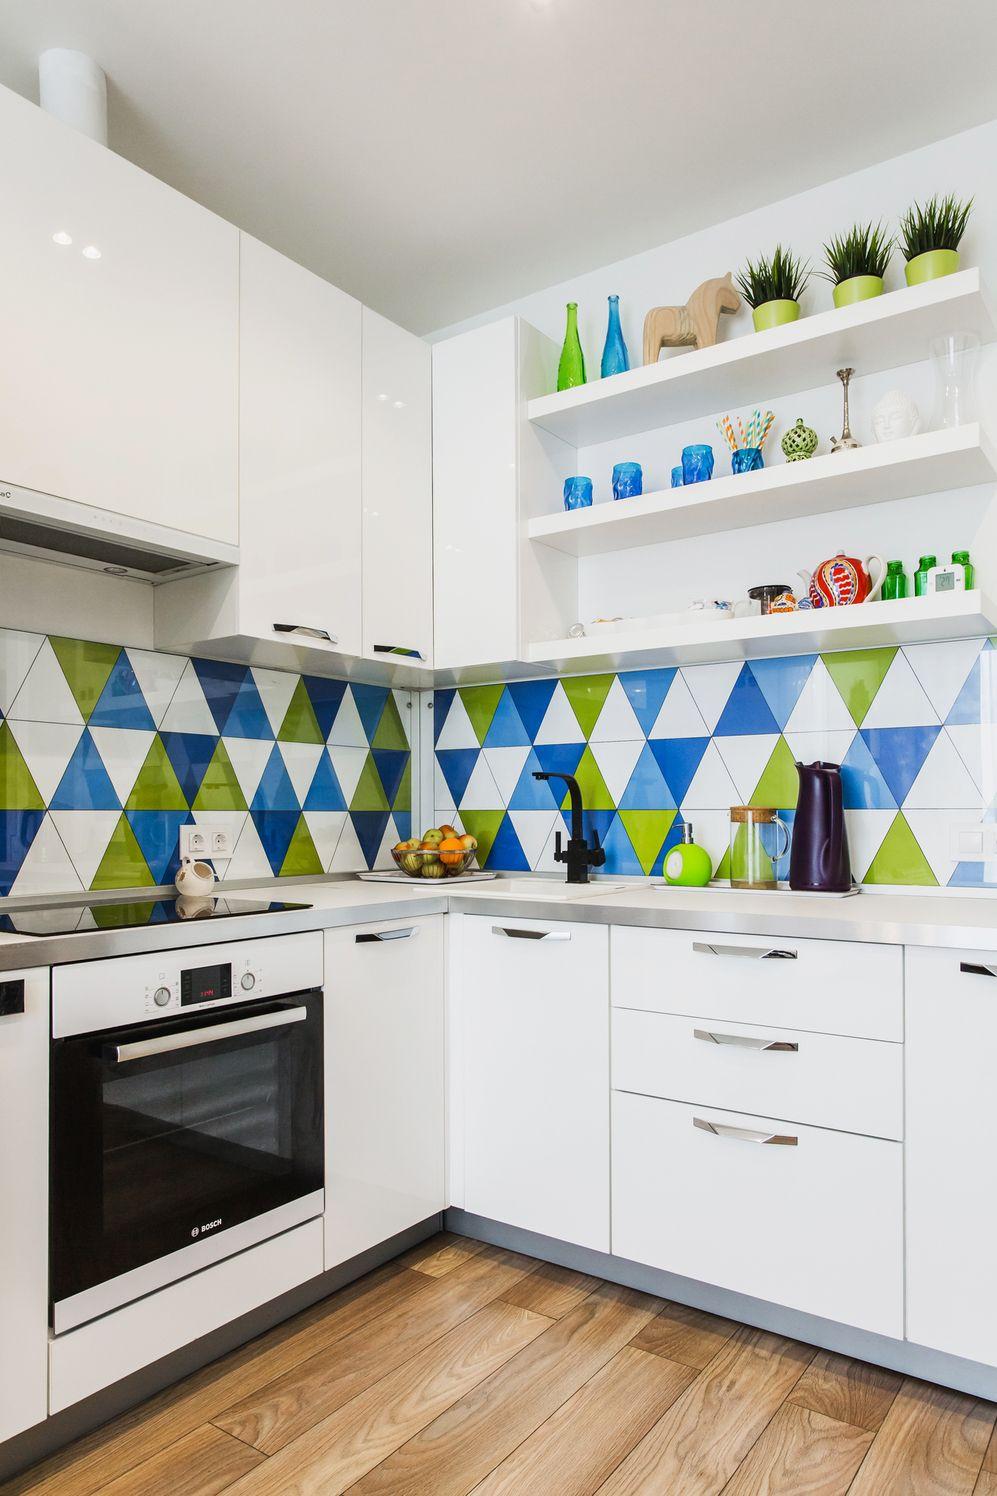 дизайн ремонта кухни